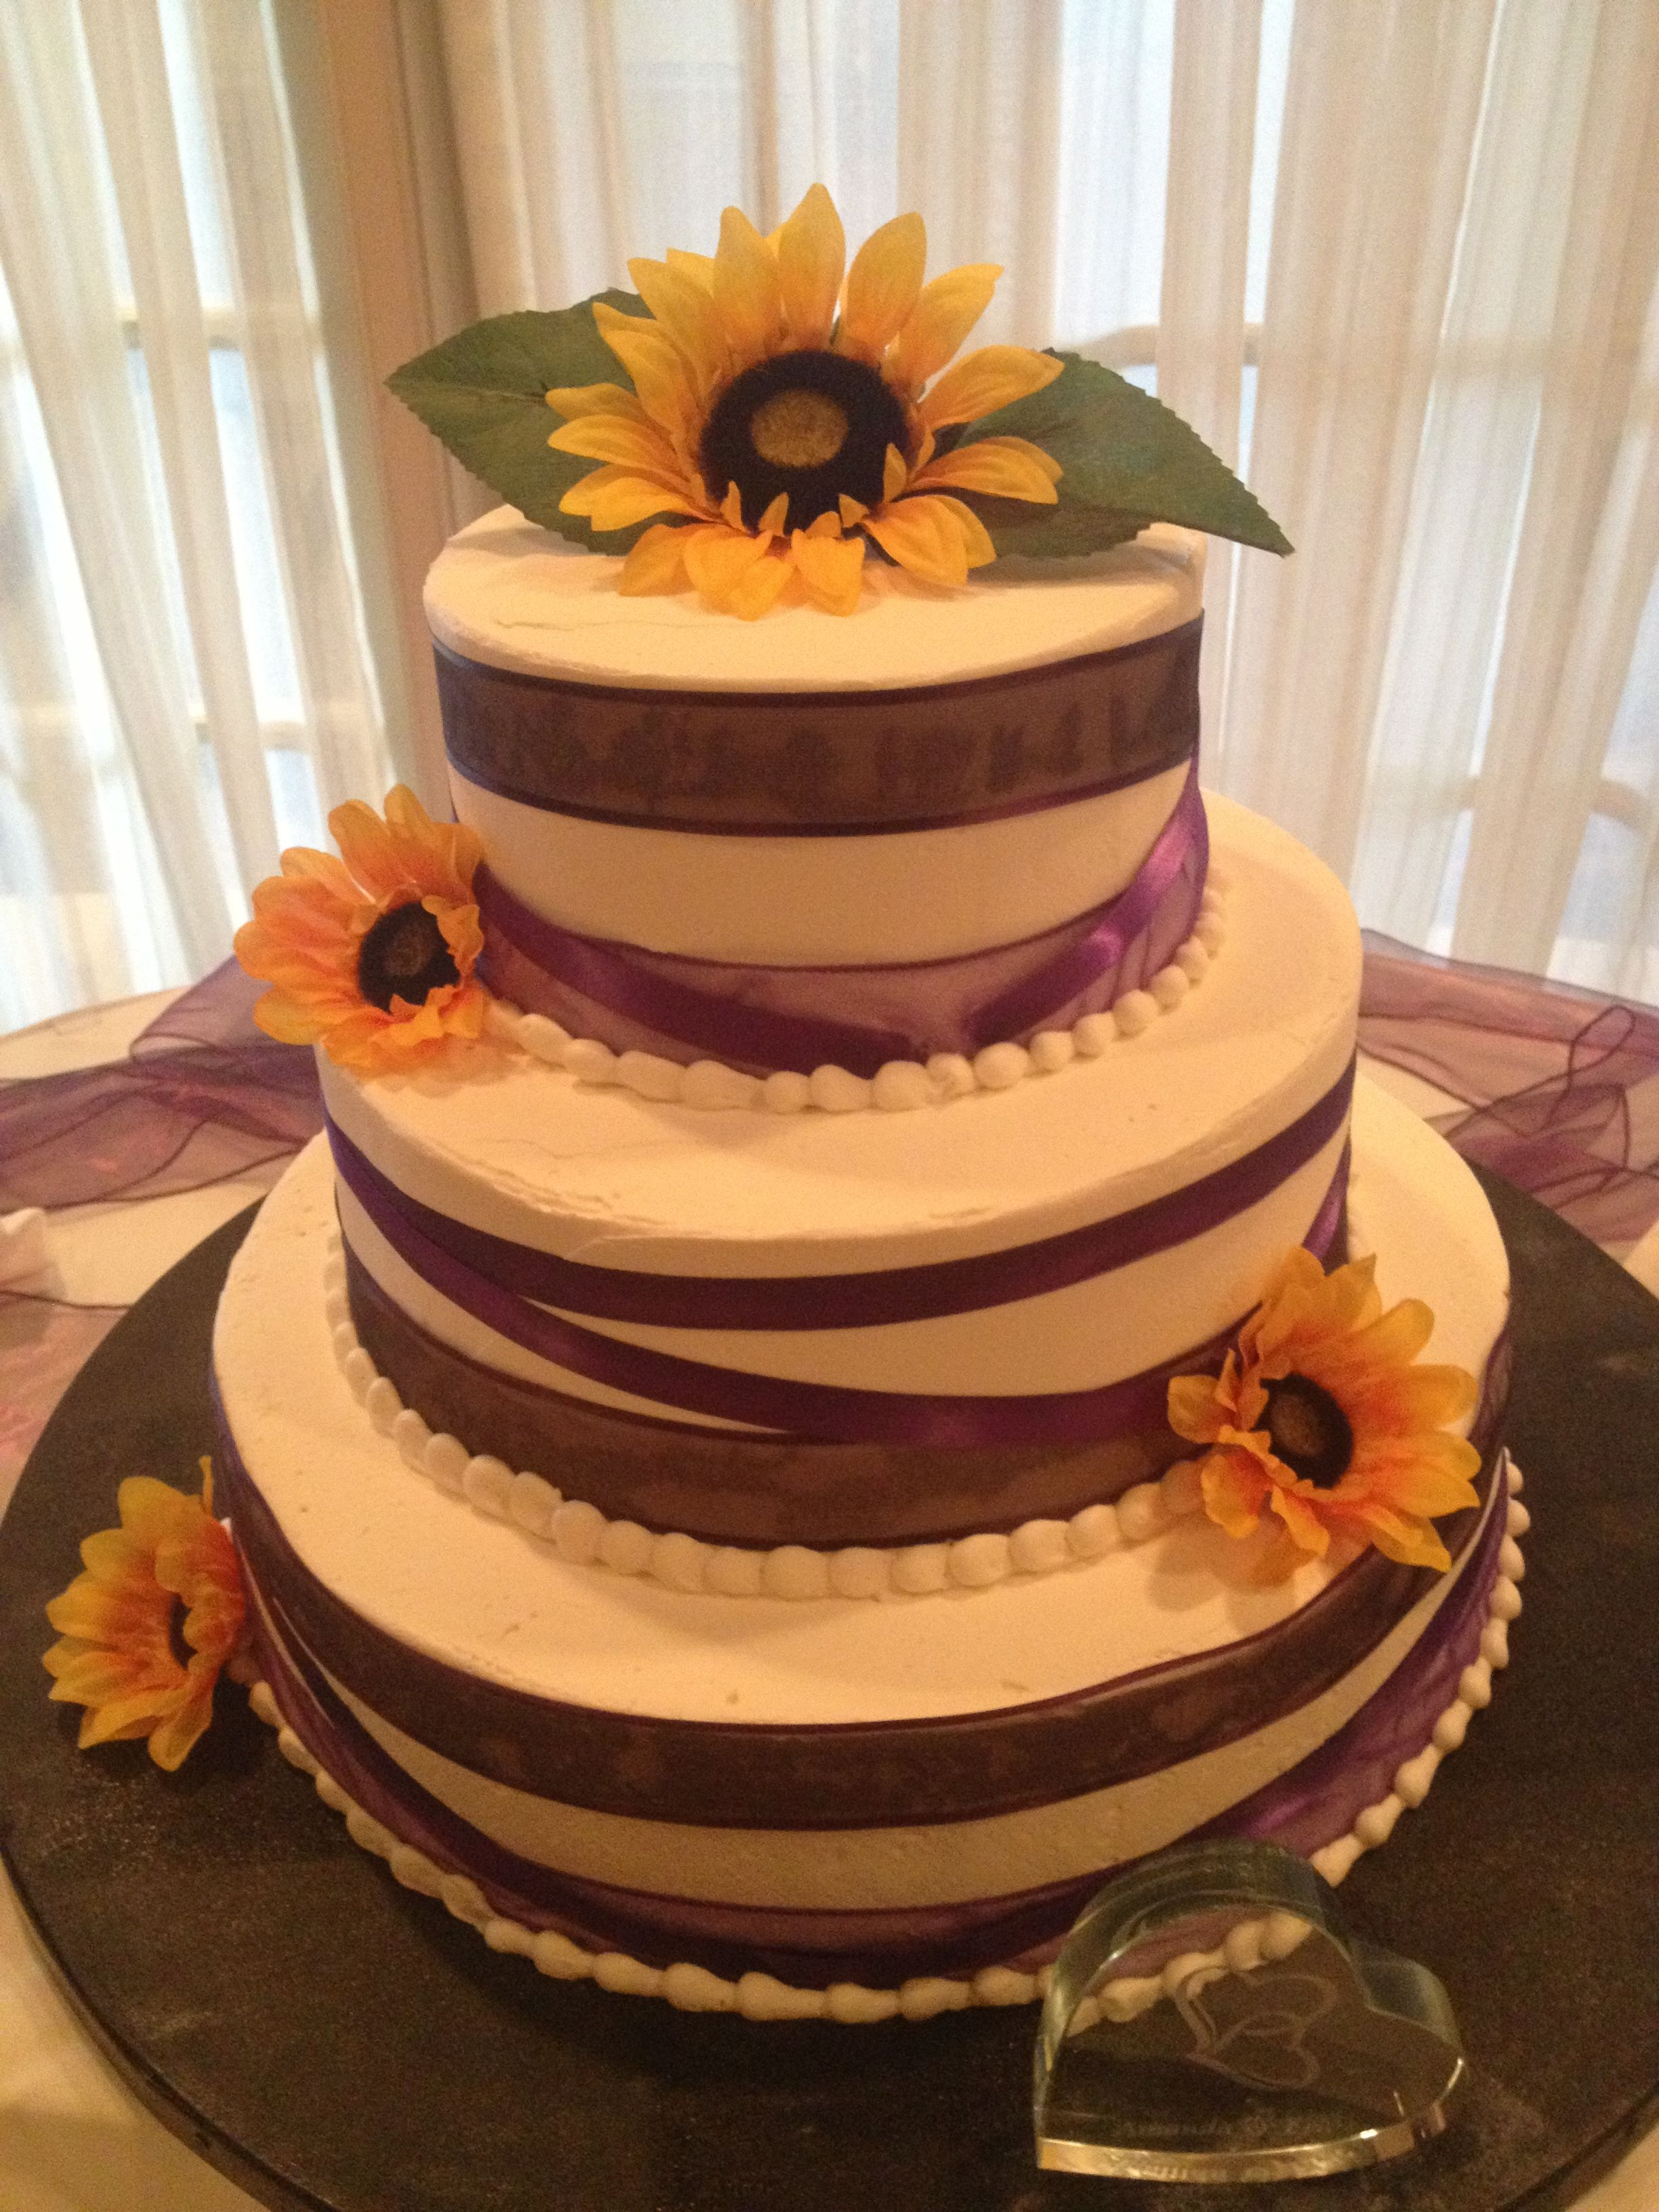 White wedding cake with purple ribbon and yellow